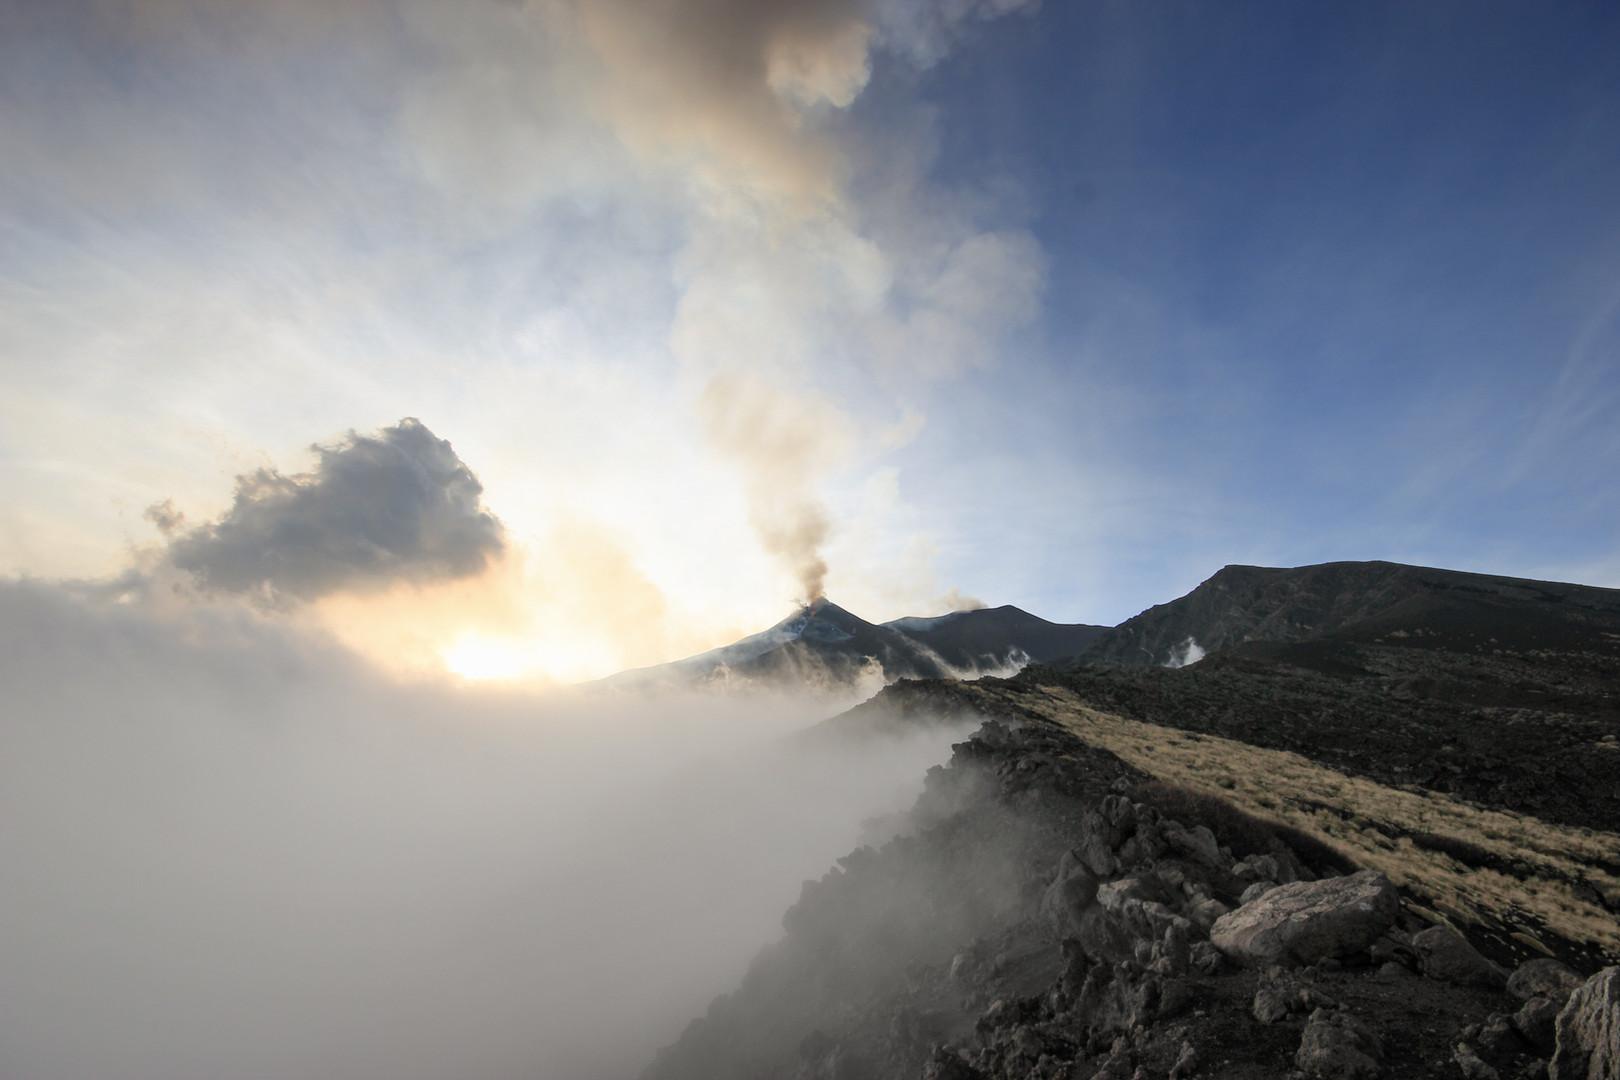 Wunderschöne Vulkanlandschaften